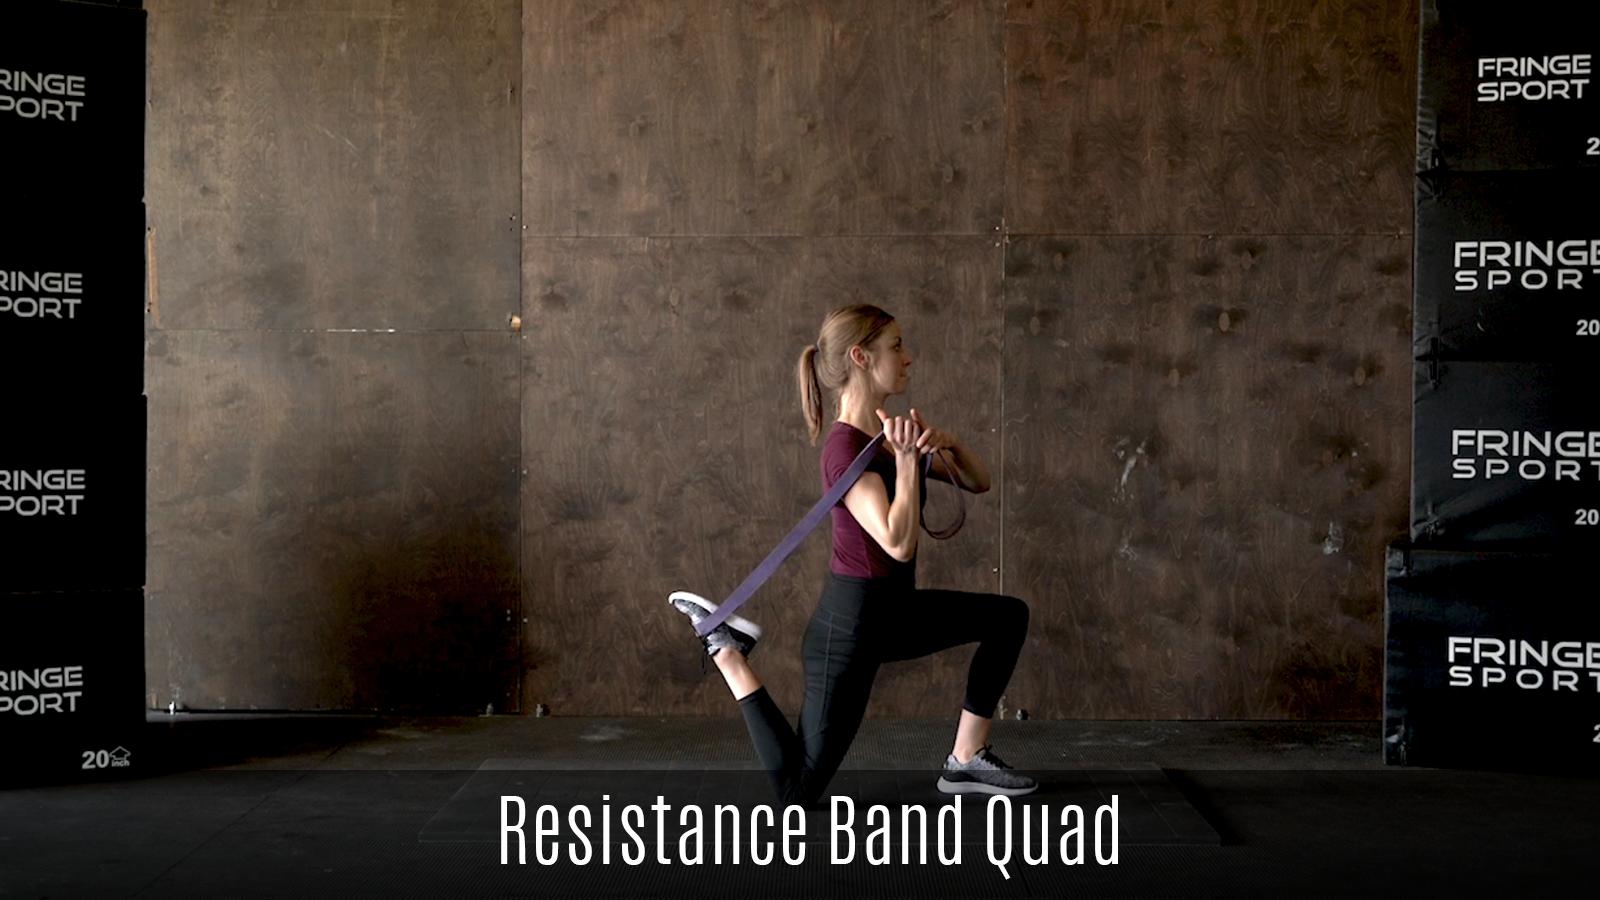 quad stretch demo using resistance band